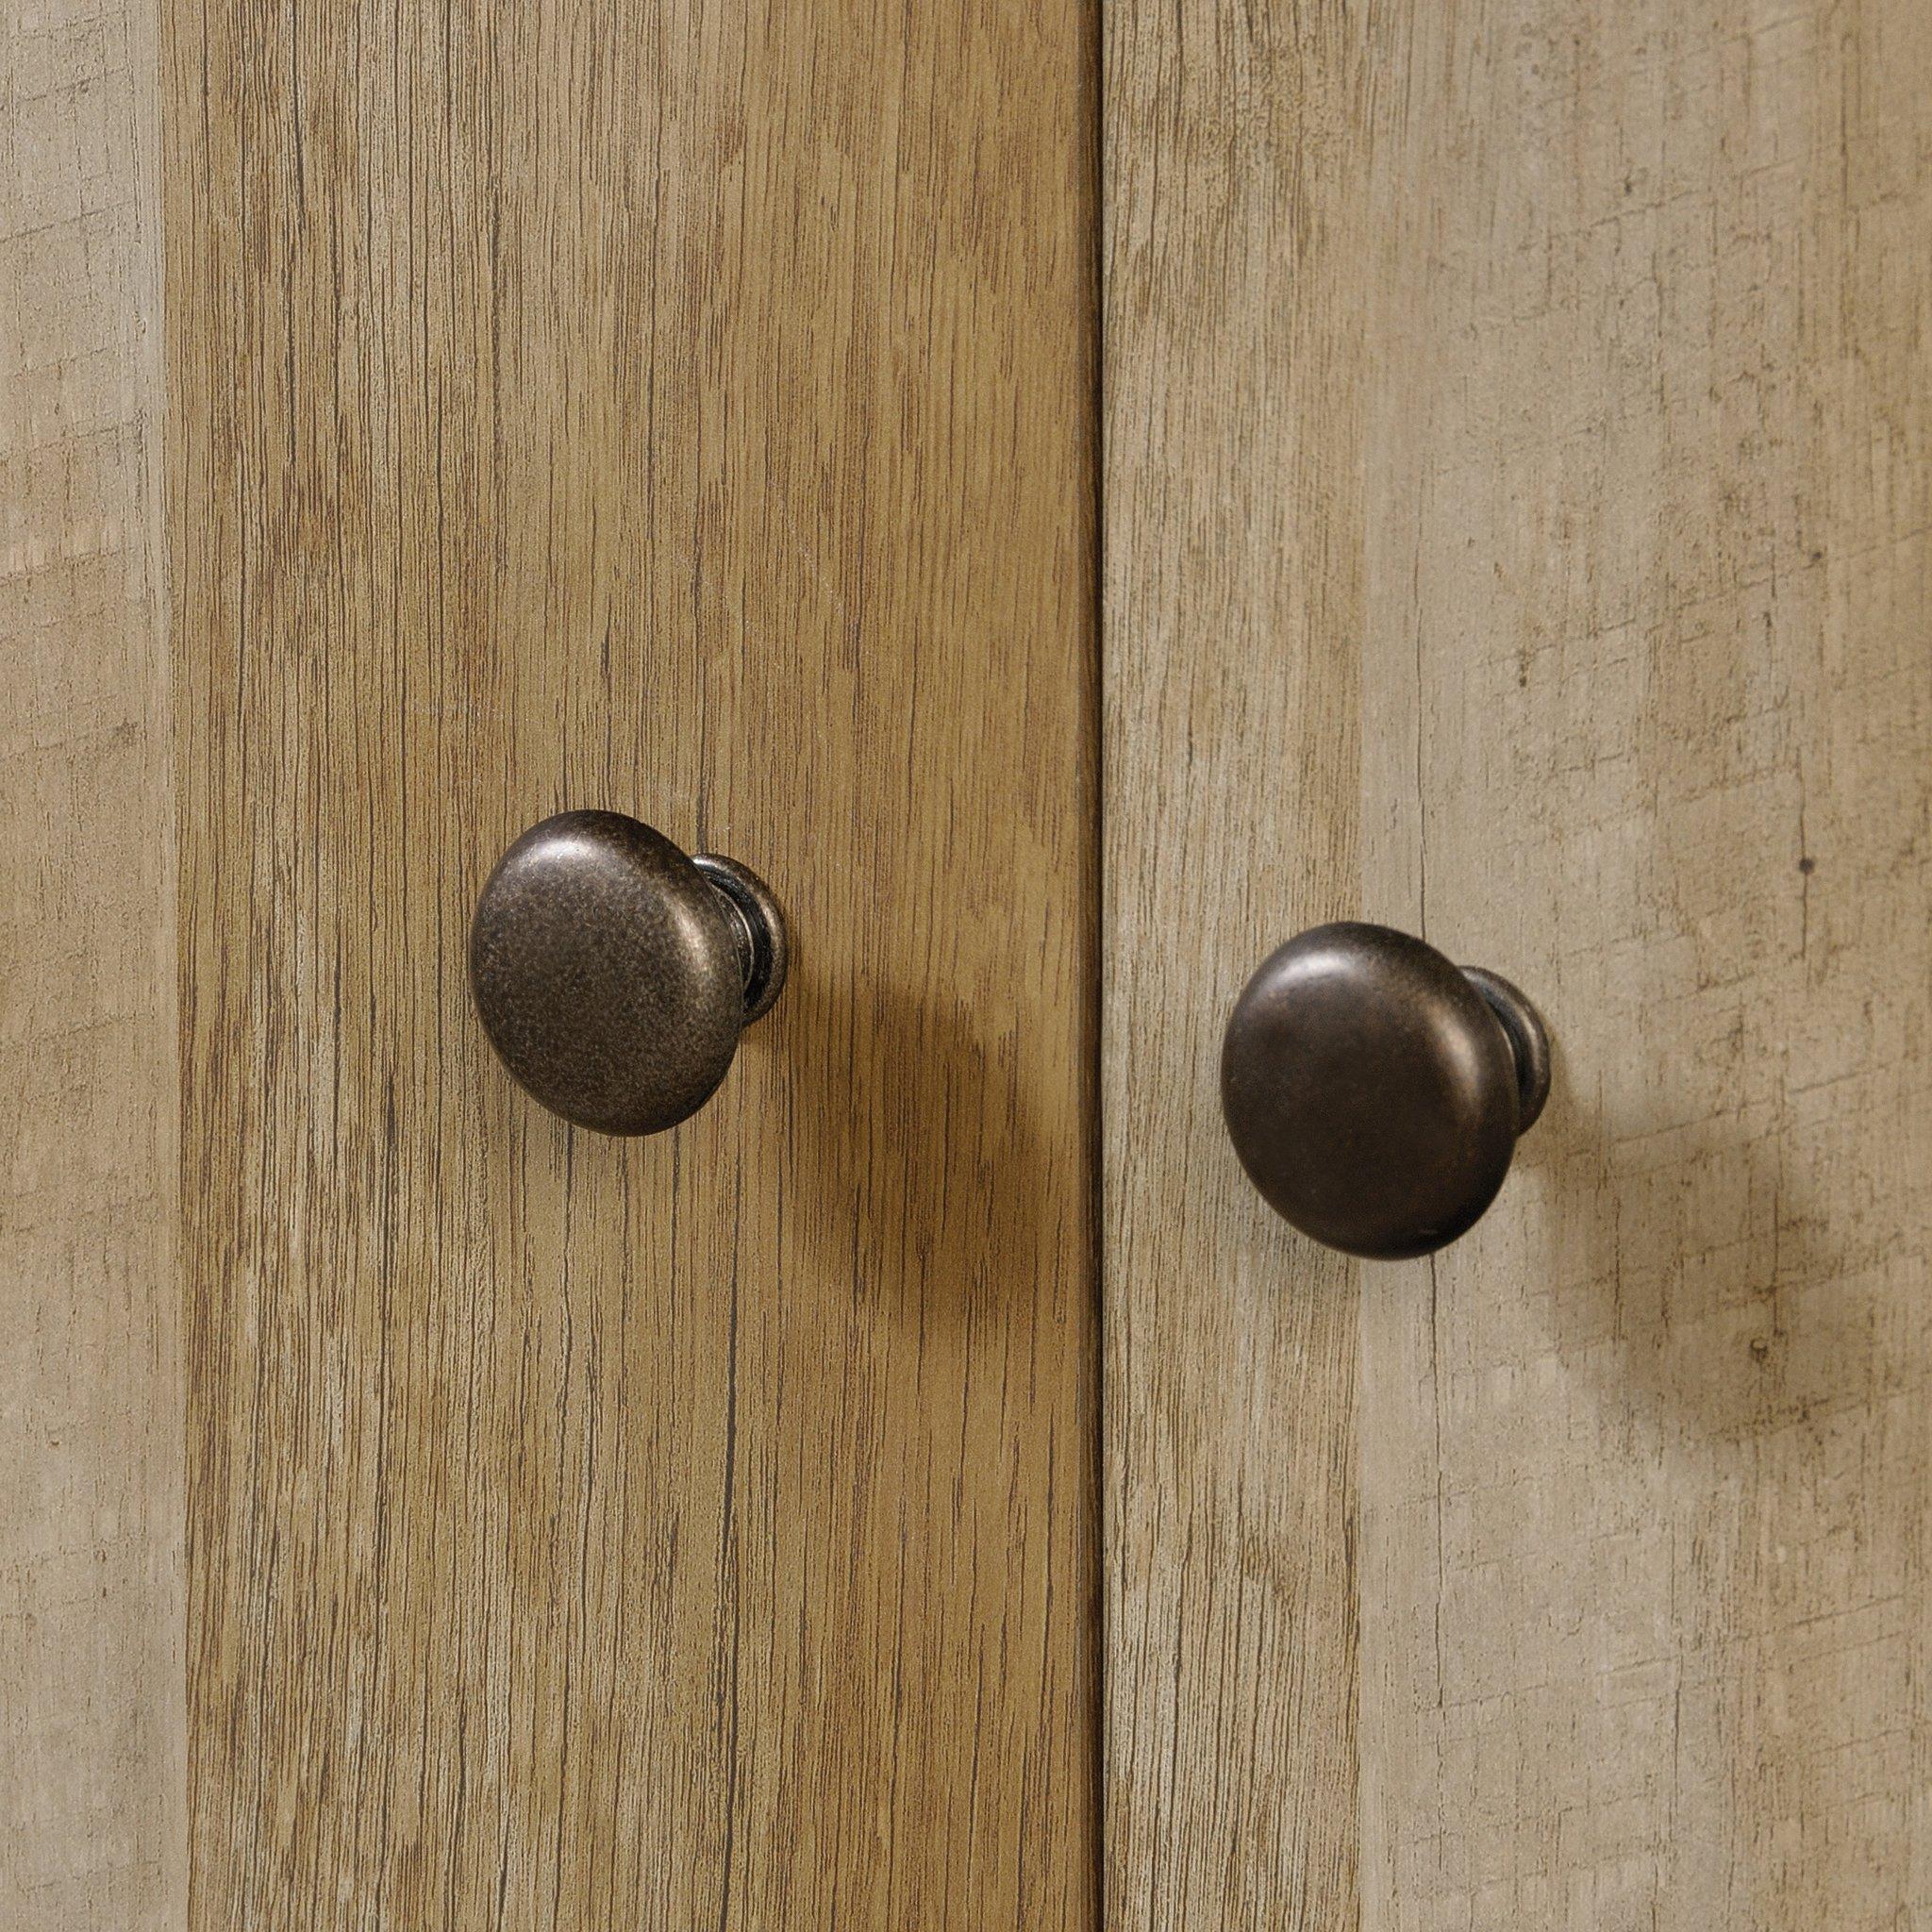 Sauder 419077 Dakota Pass Armoire, 33.78'' L x 19.53'' W x 57.84'' H, Craftsman Oak finish by Sauder (Image #7)